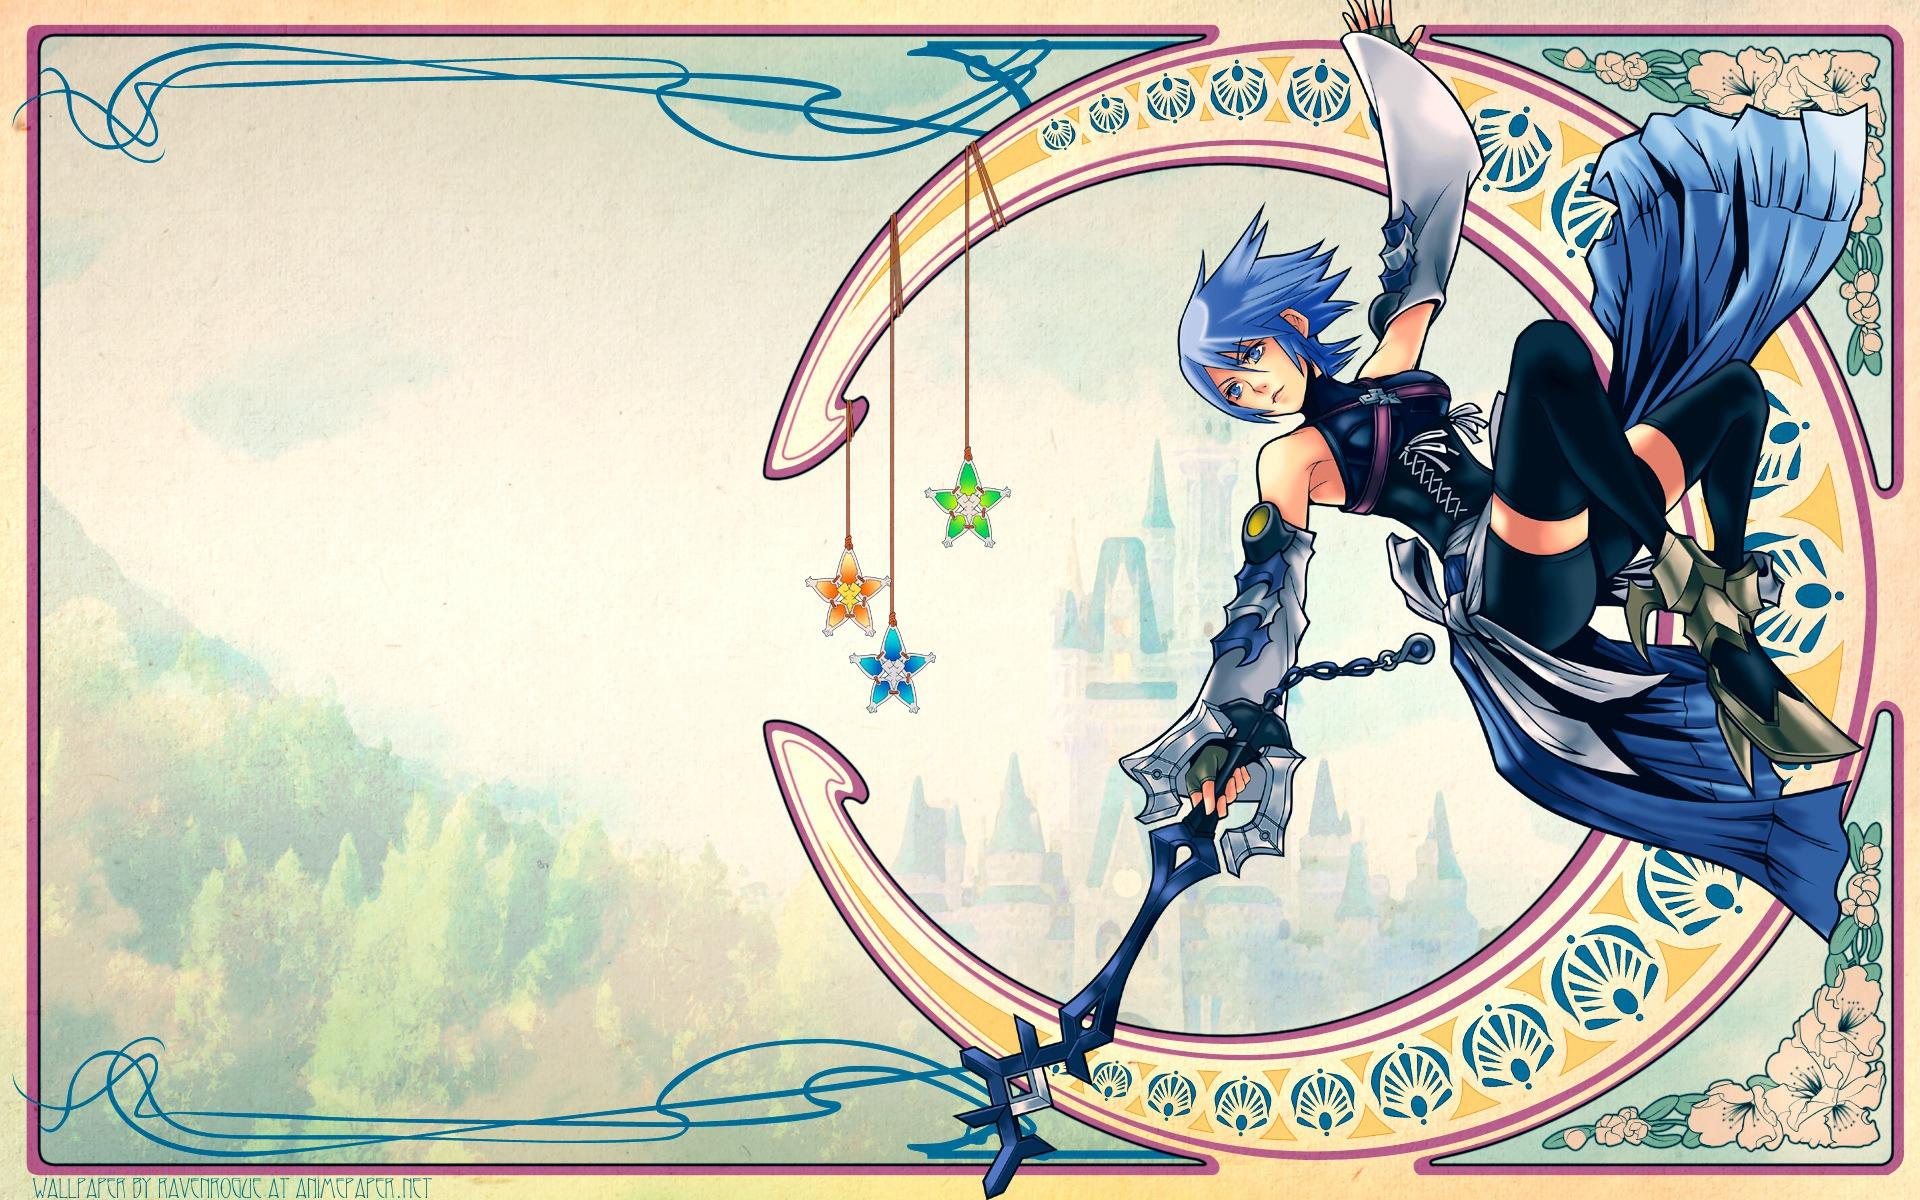 Aqua Kingdom Hearts Full